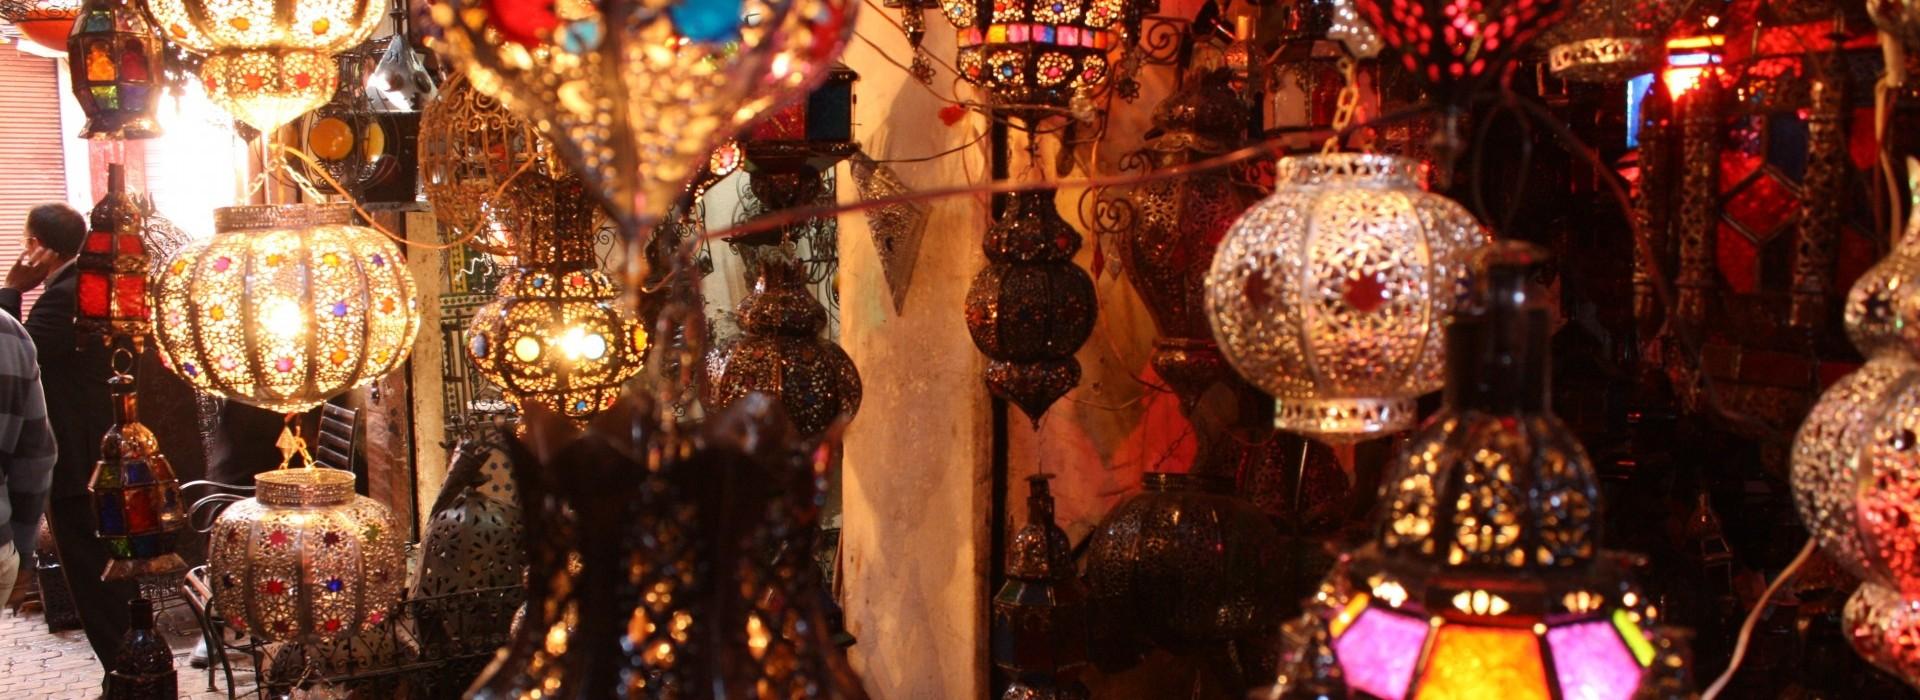 Marrakech-Souks--e1411845032434